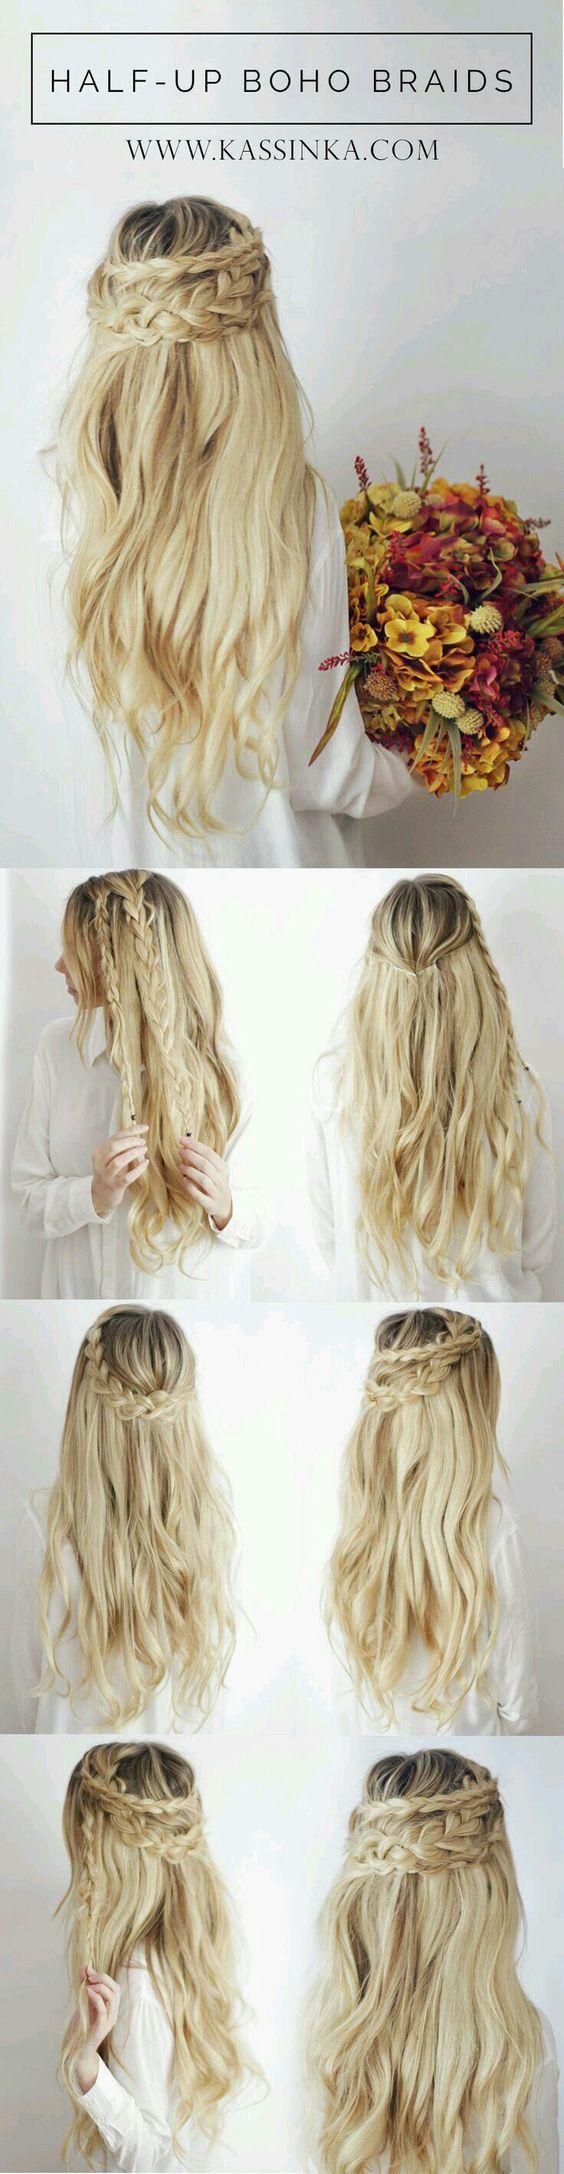 ♡ half-up boho braids ♡: